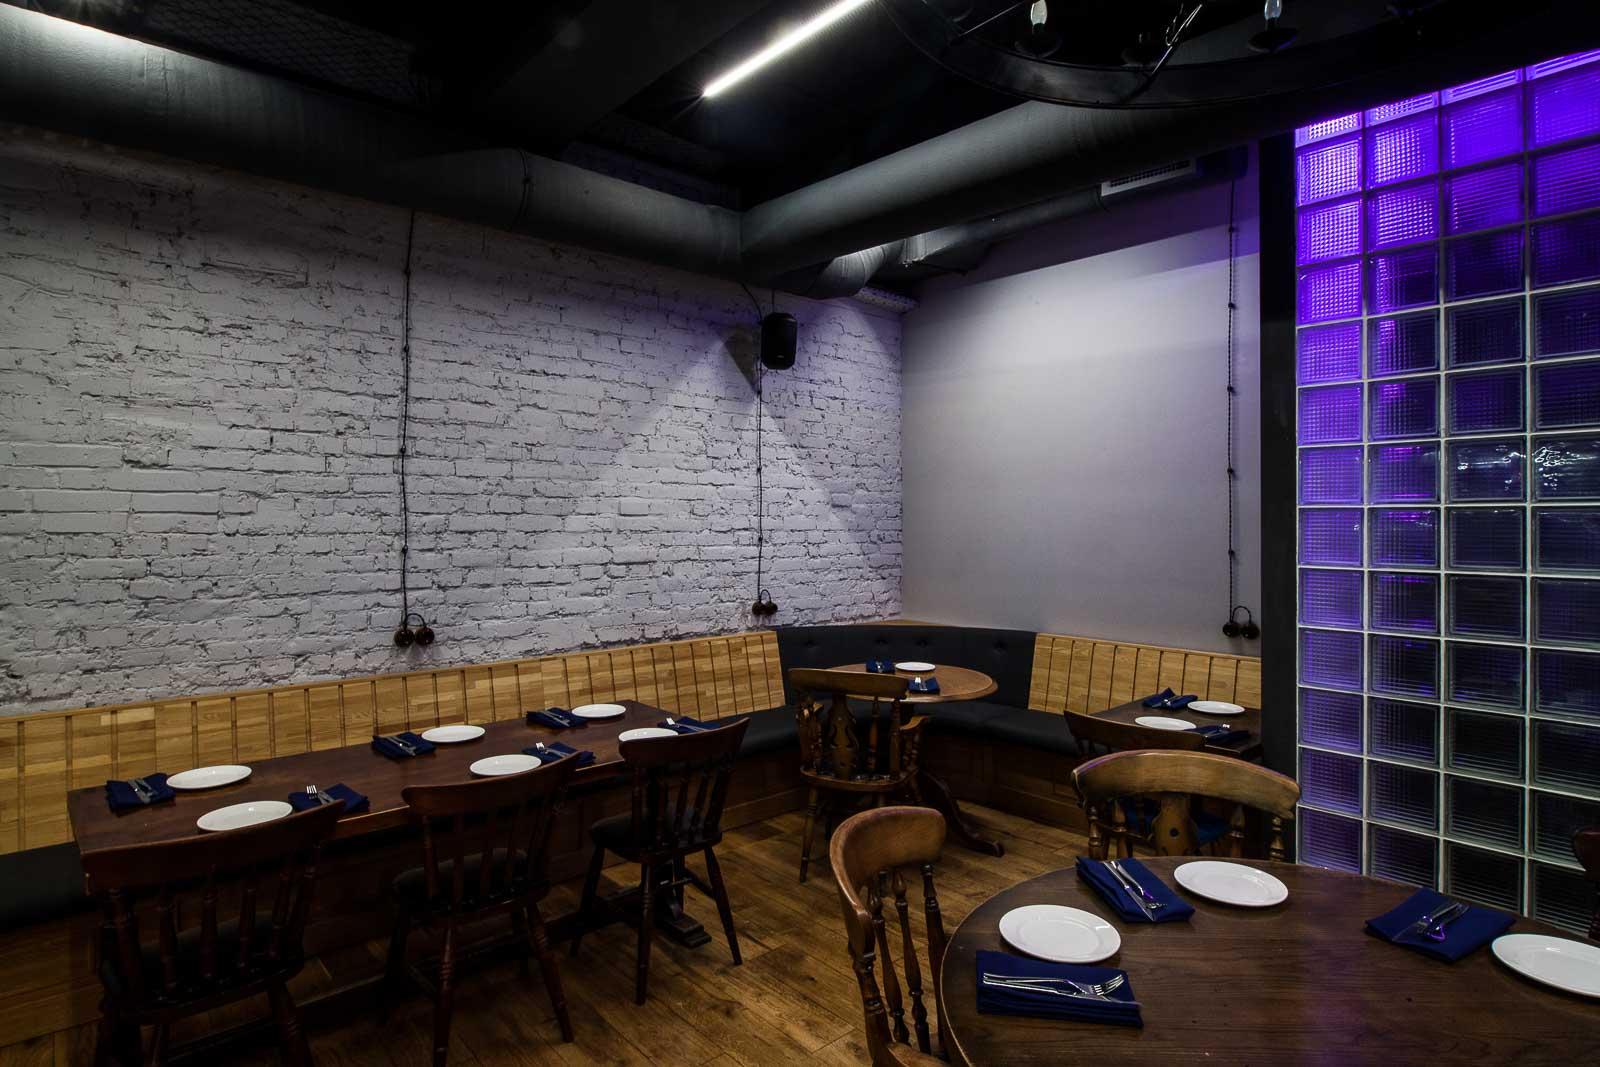 Galss blocks with violet light